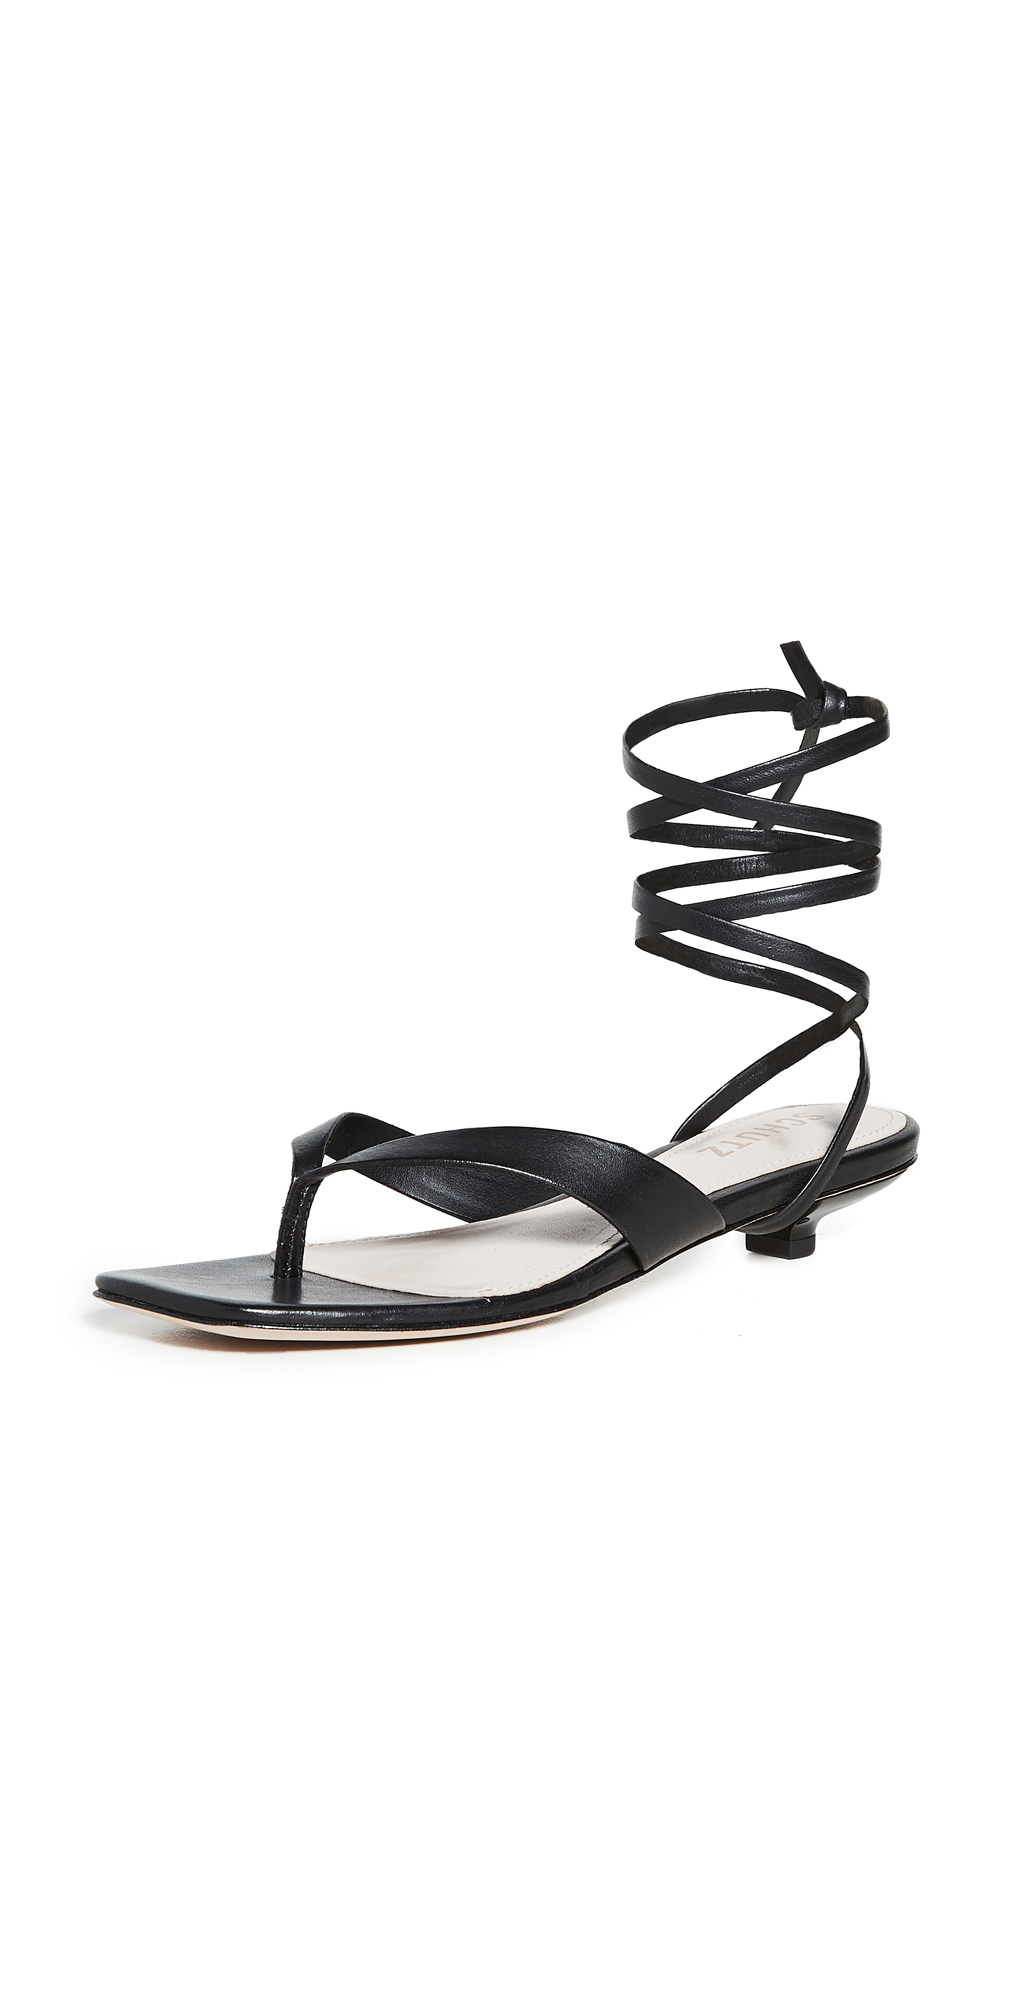 Schutz Leni Sandals